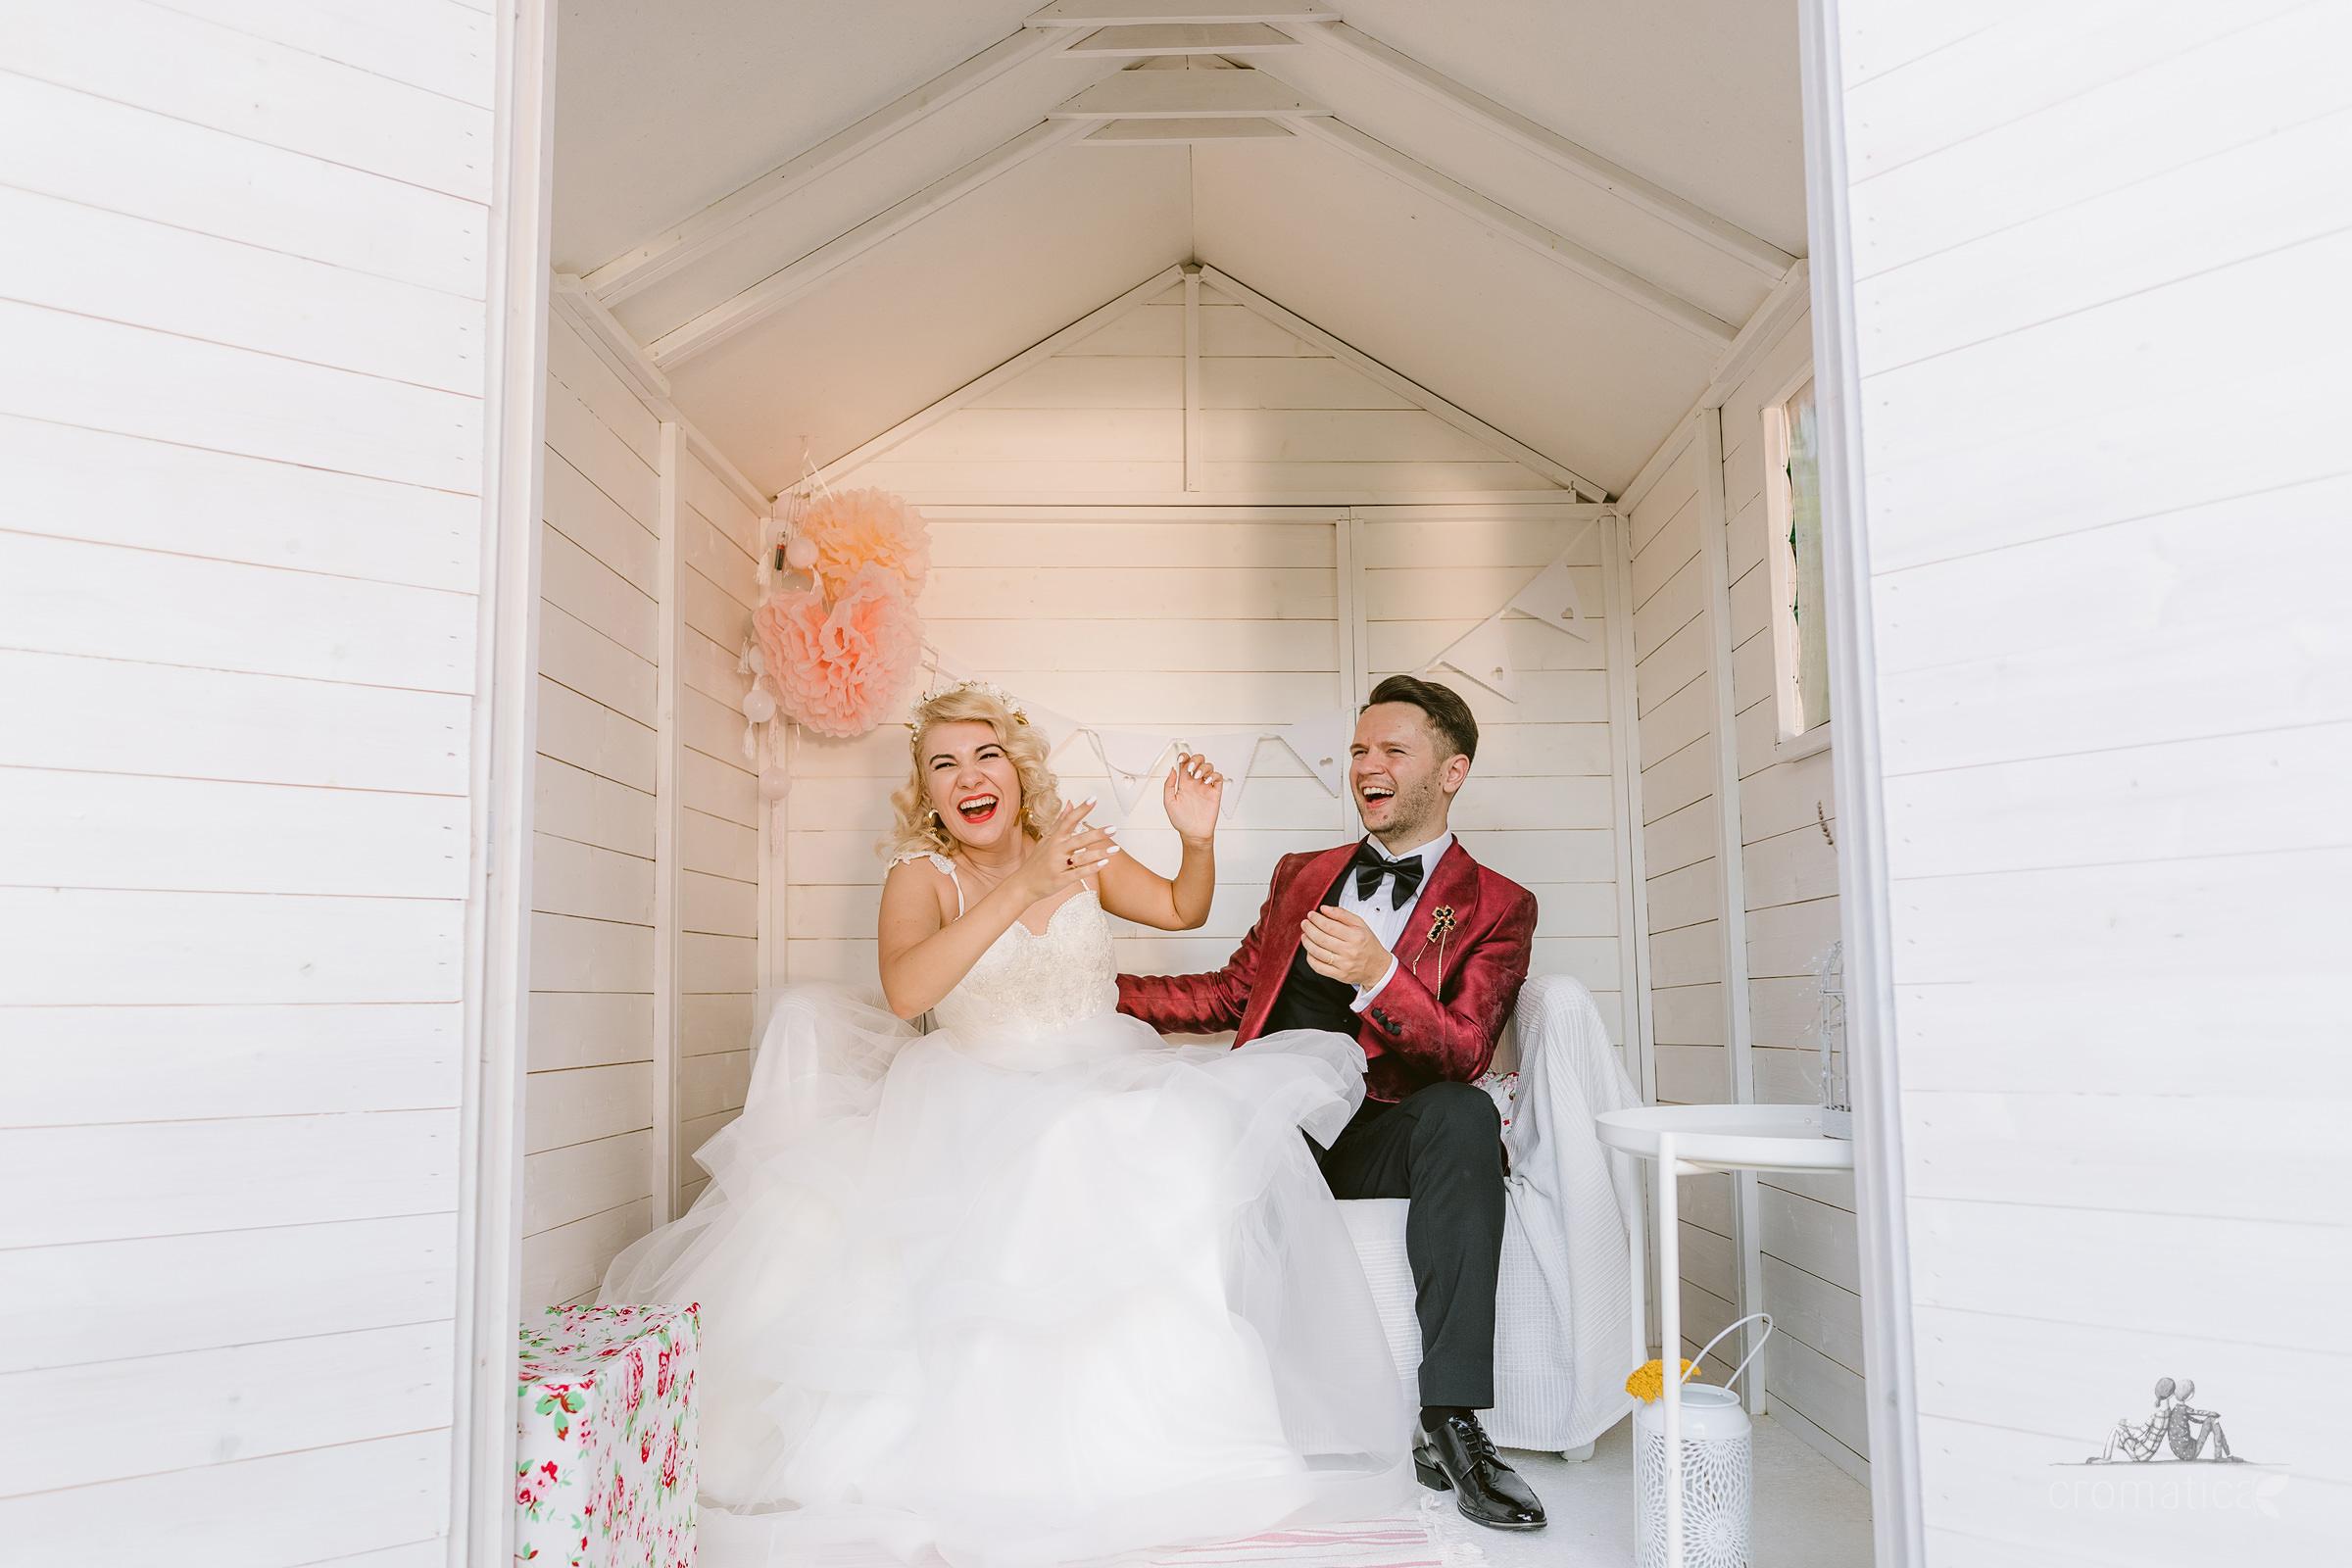 ana mihai fotografii nunta gradina lahovari 068